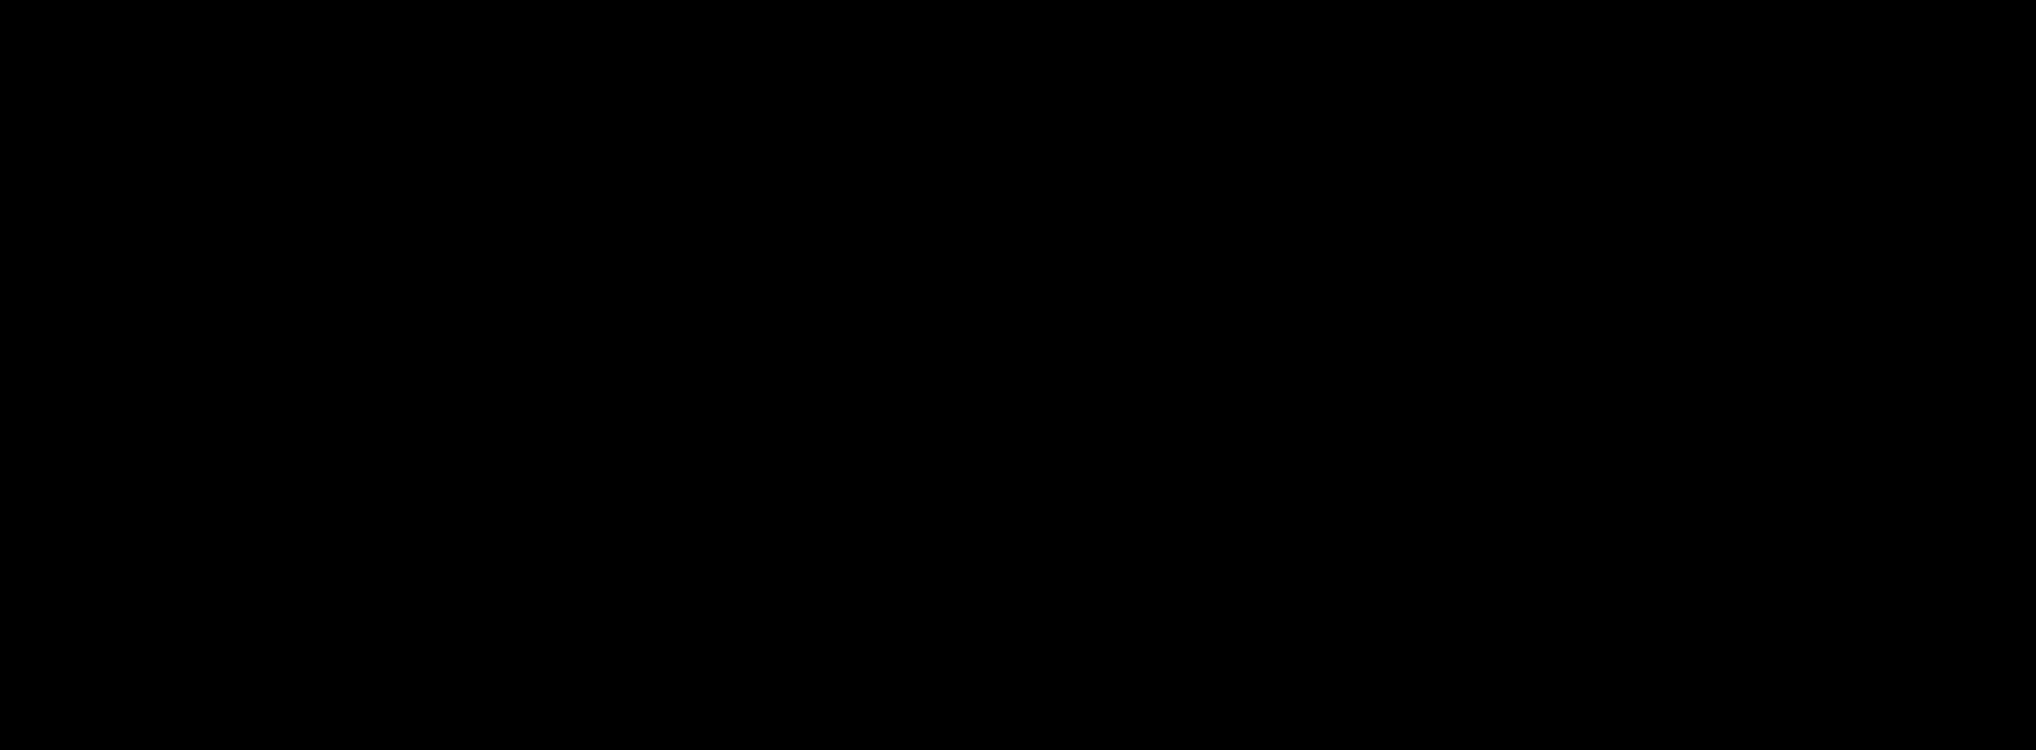 Silhouette,Logo,Symbol